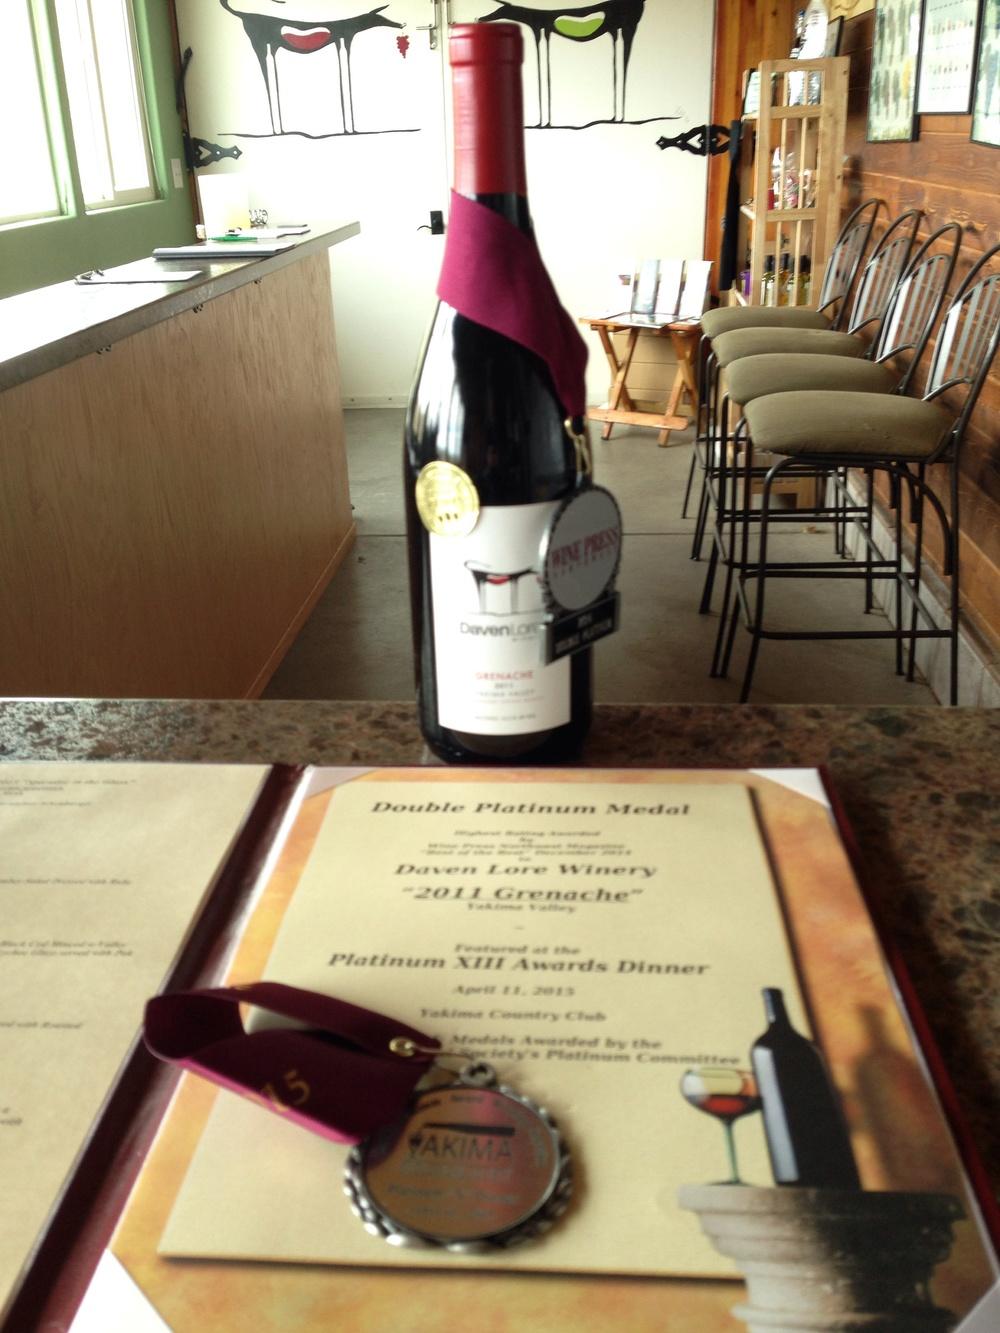 Grenache 2011 Yakima Valley Lonesome springs Ranch vineyard designate.